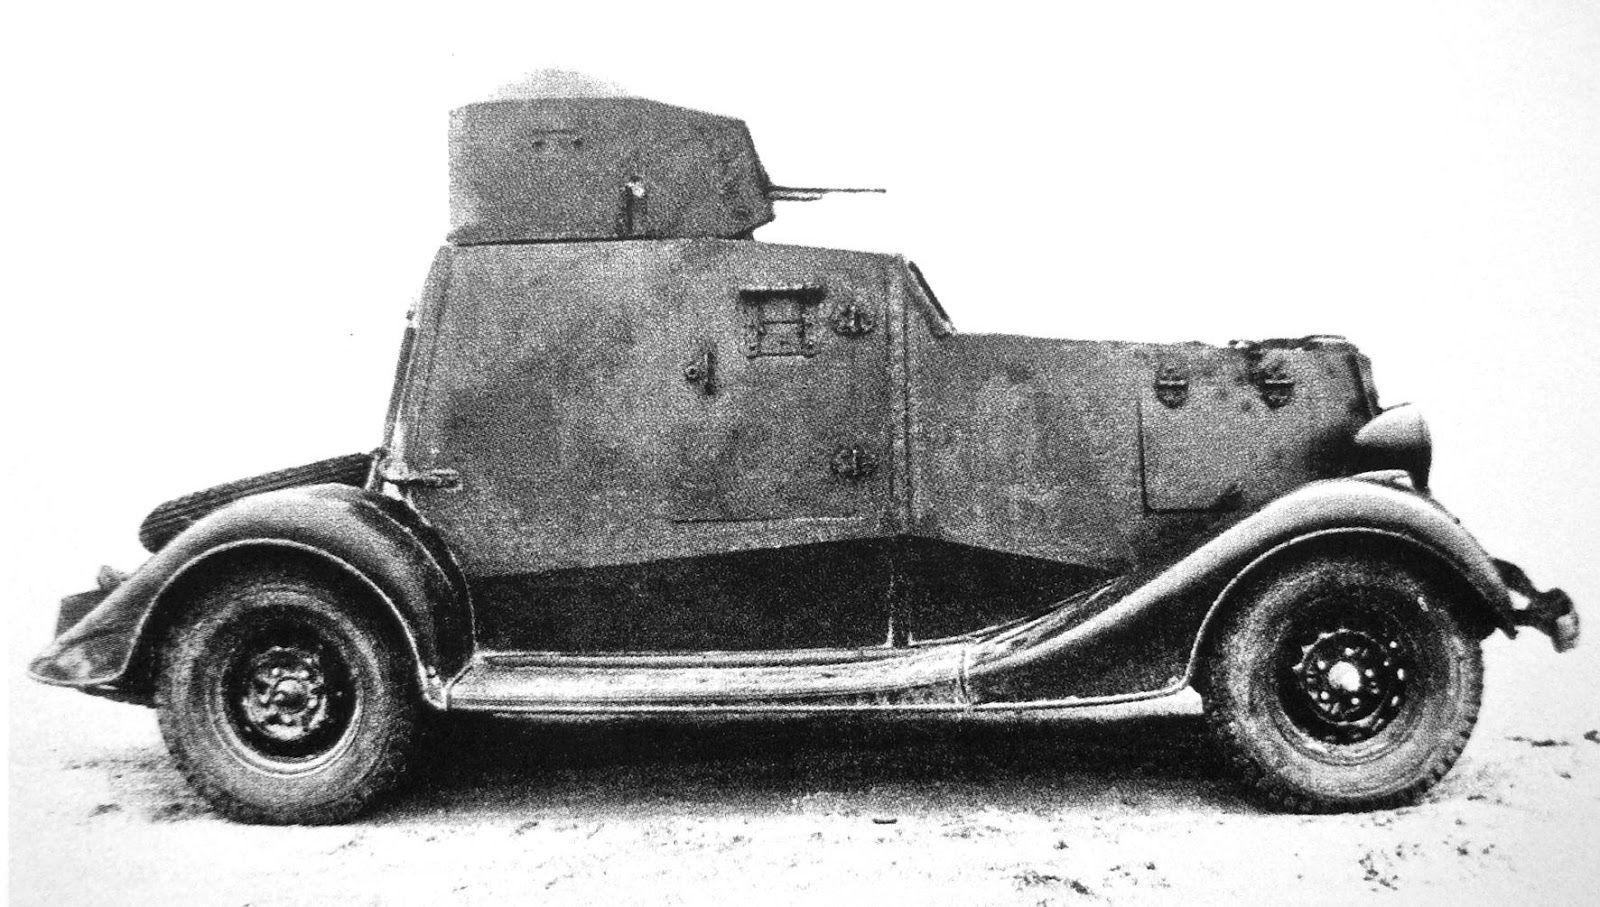 армейские легковушки СССР 19